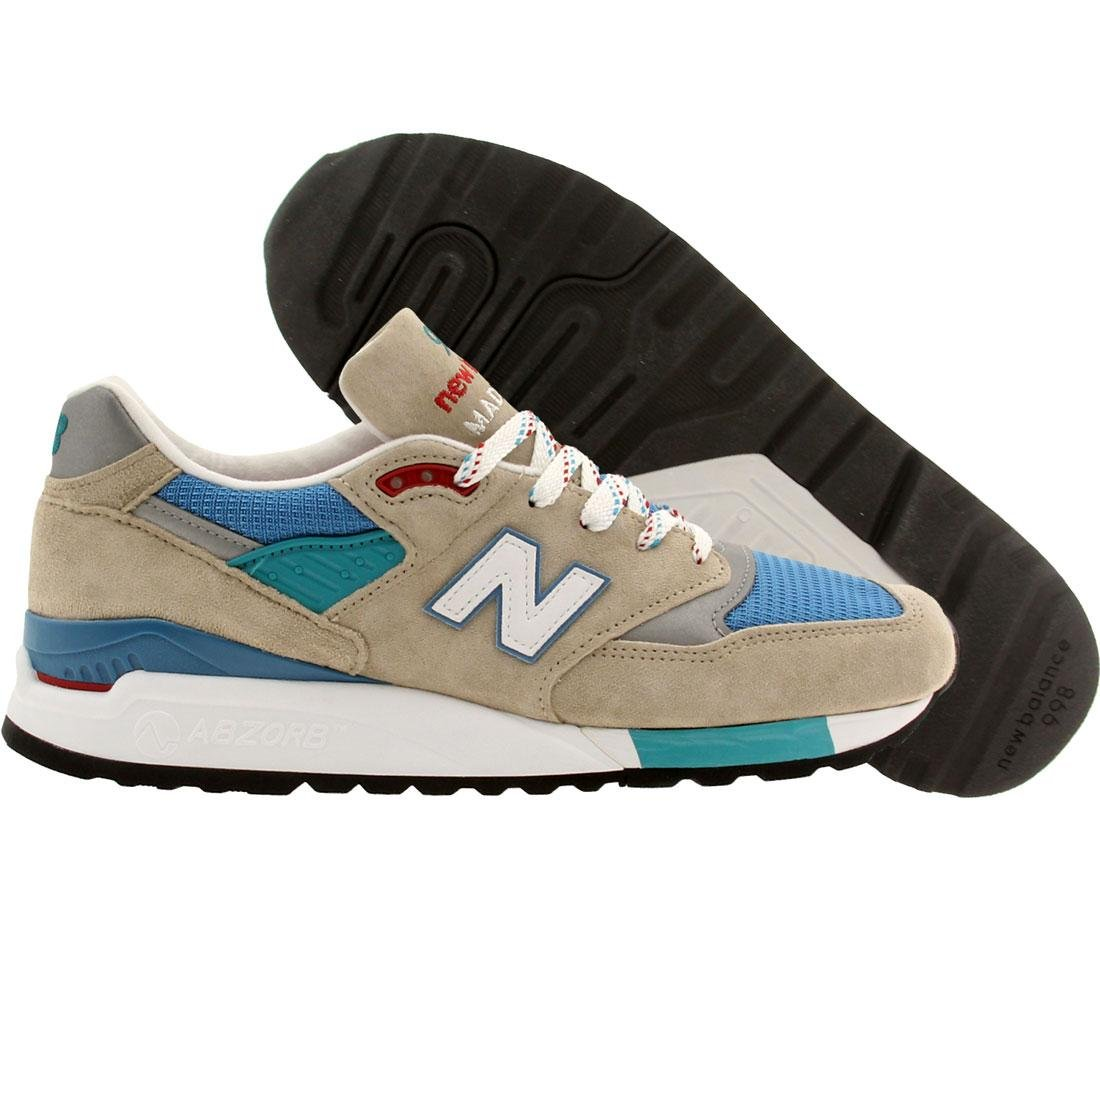 New Balance Men's 998 Classics Sand Blue Surf/Sea Glass Running Shoe 8 Men US by New Balance